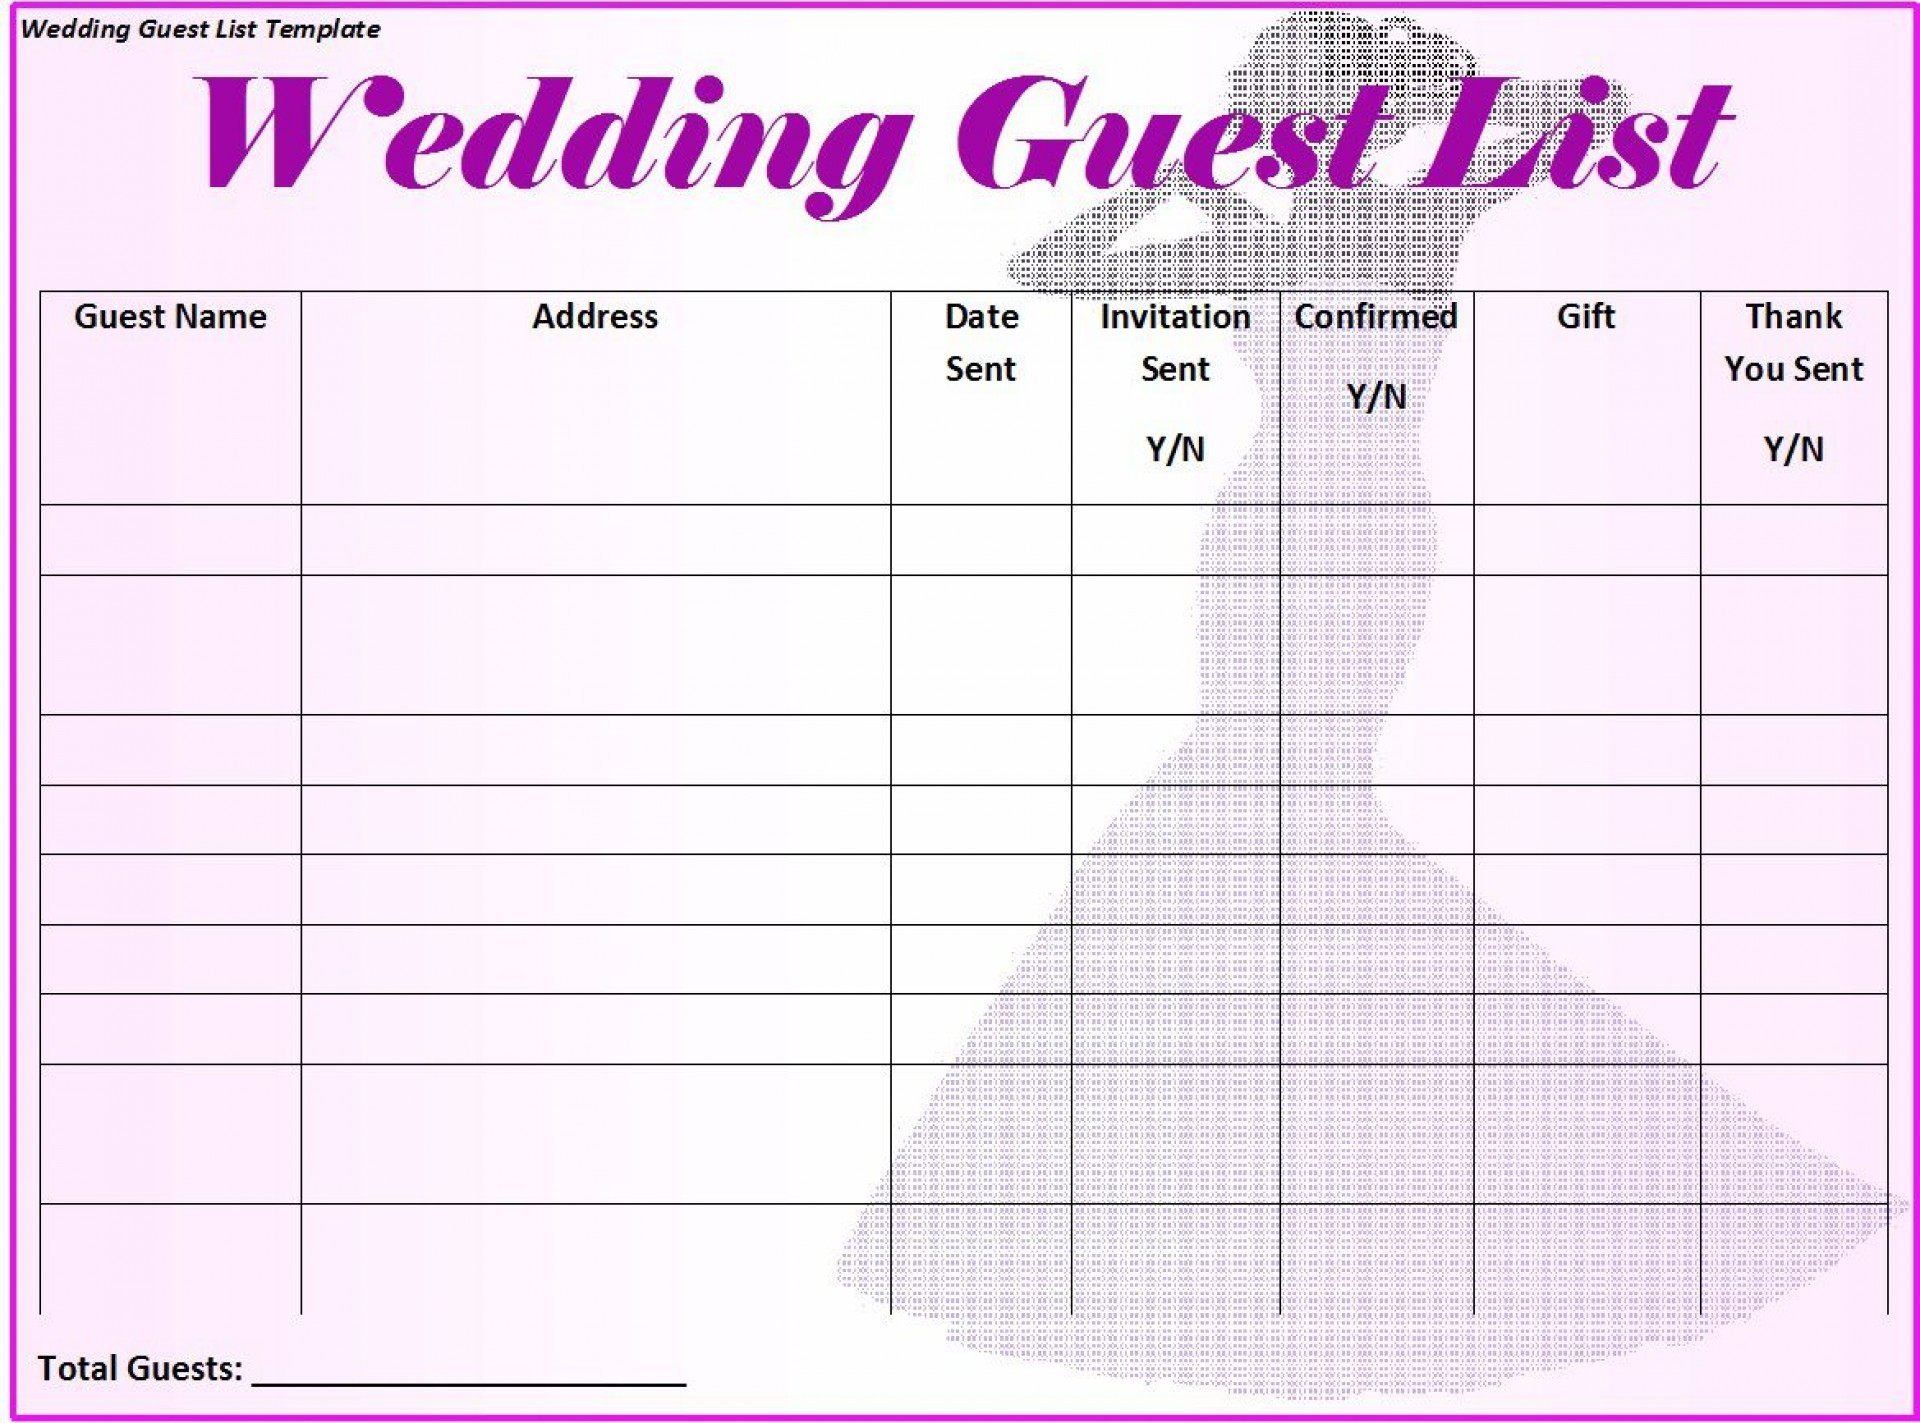 008 Magnificent Wedding Guest List Excel Spreadsheet Template Design 1920